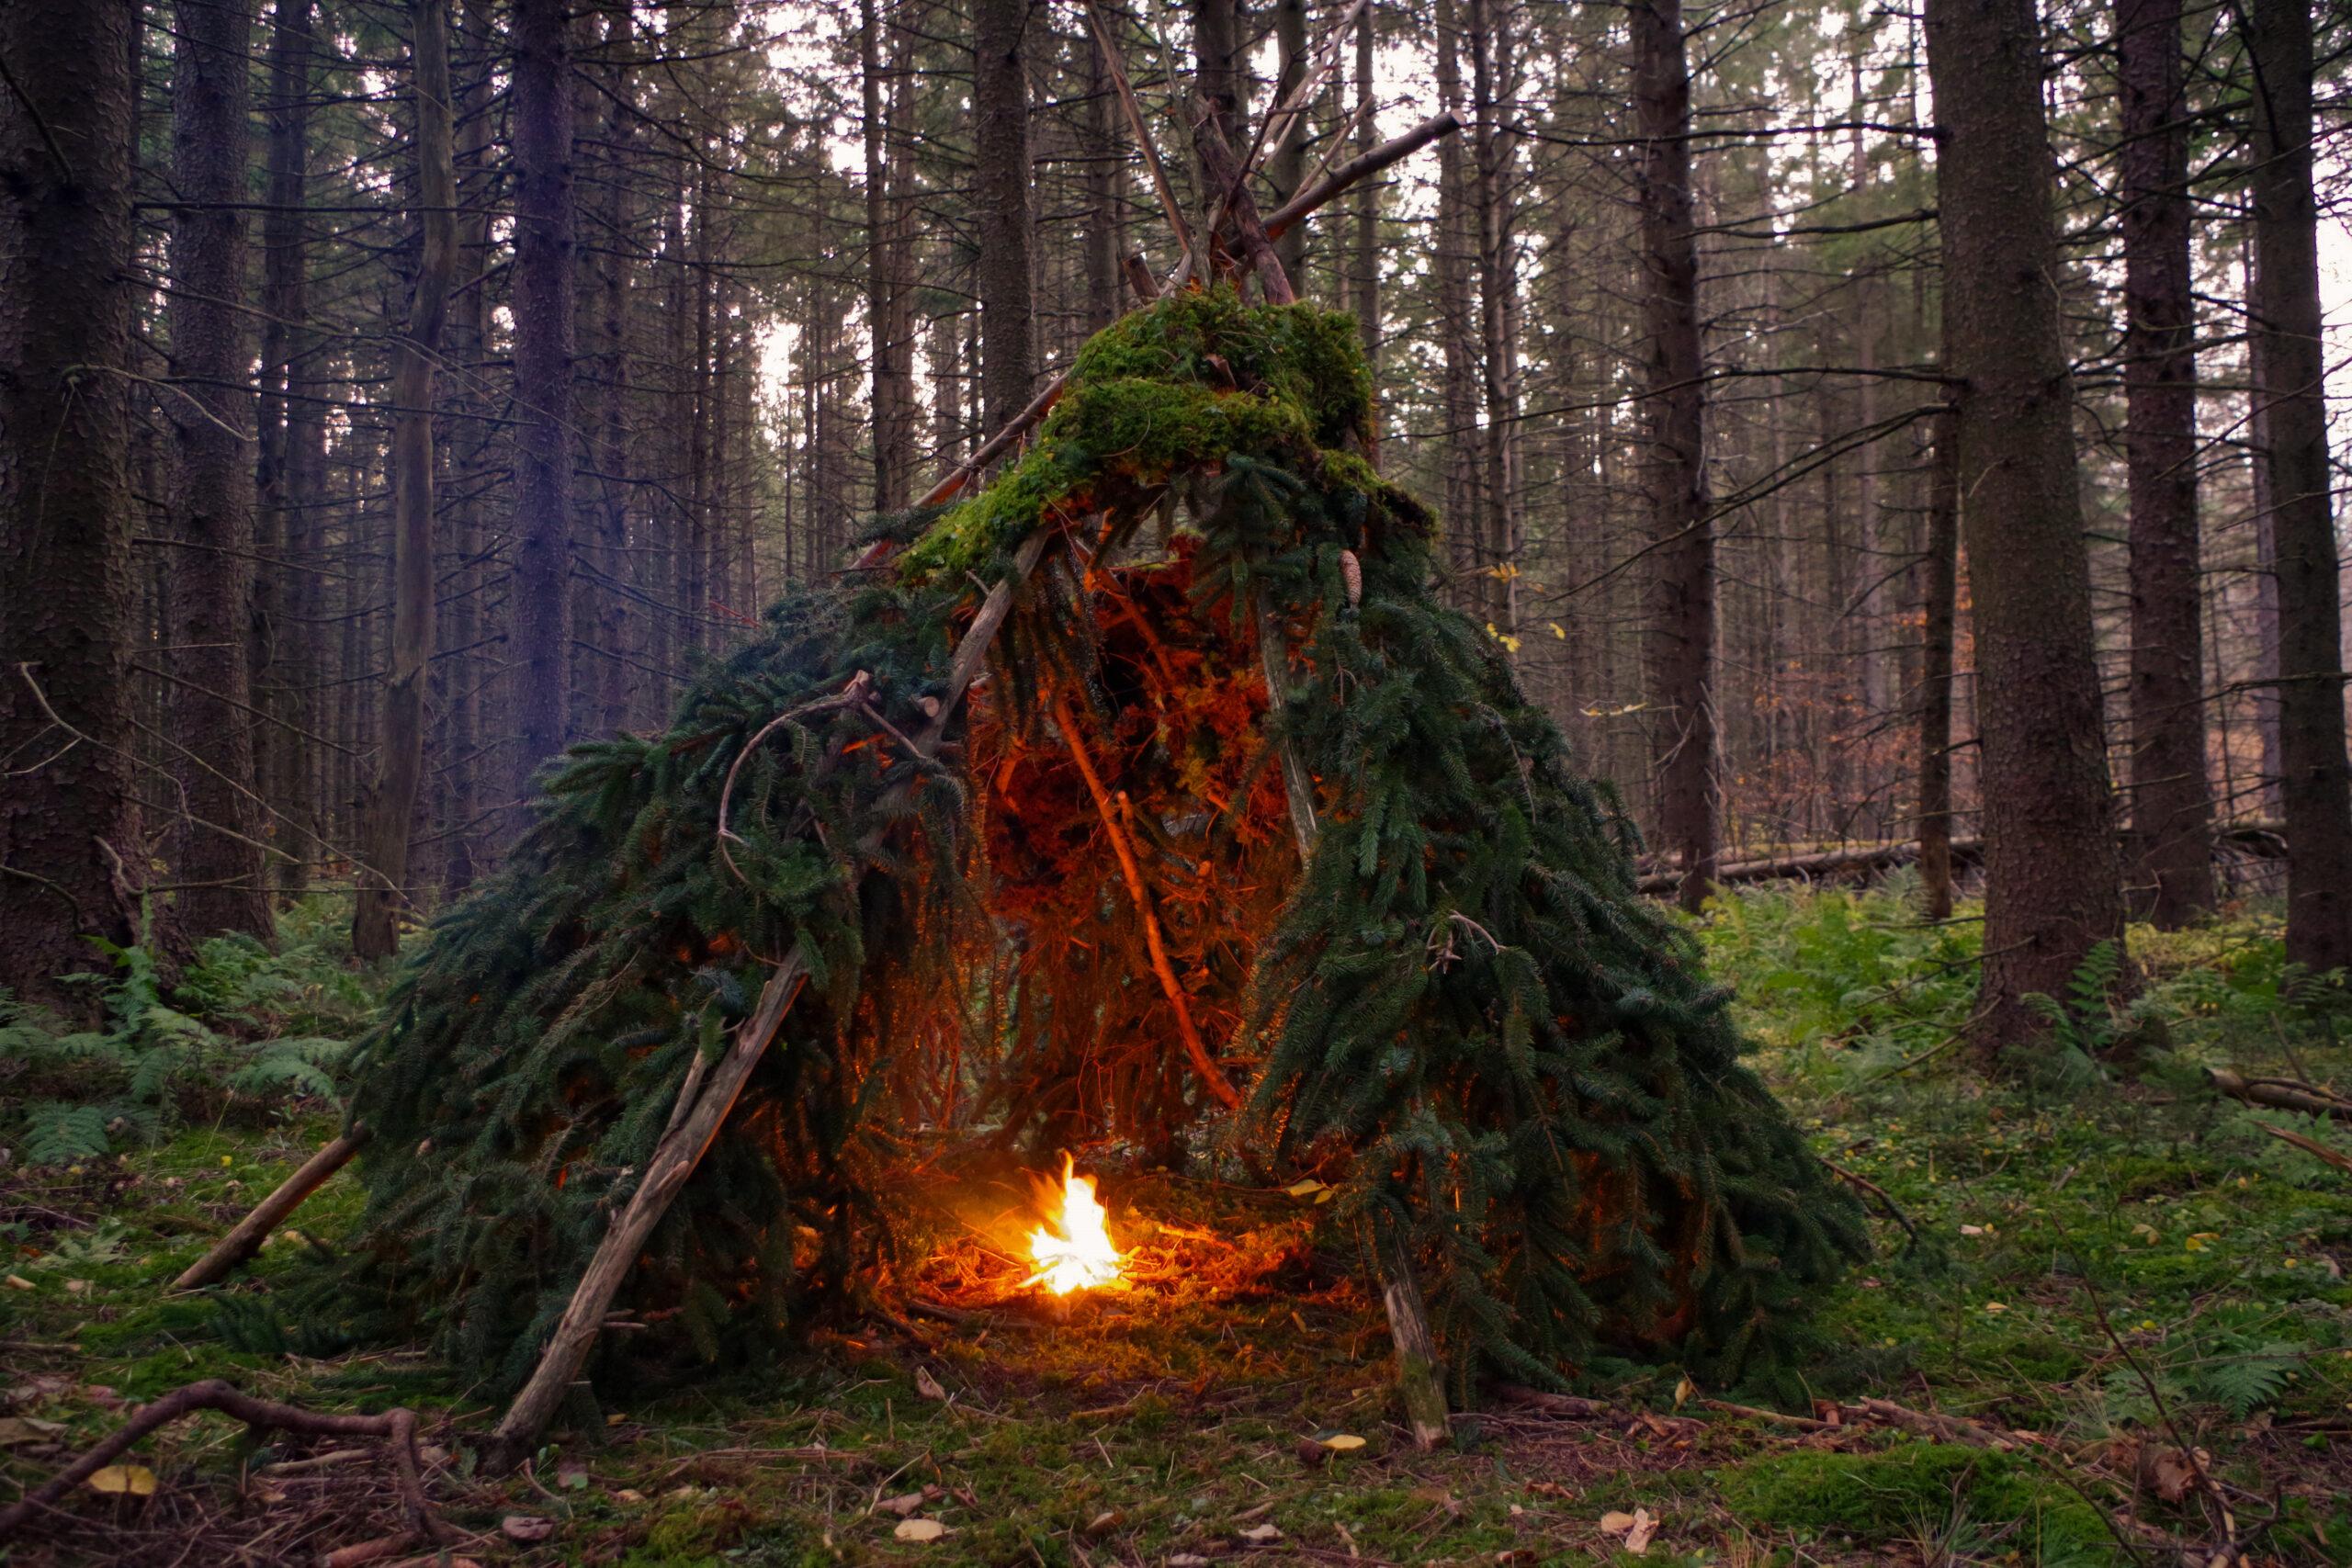 Primitive Wikiup Bushcraft Survival shelter